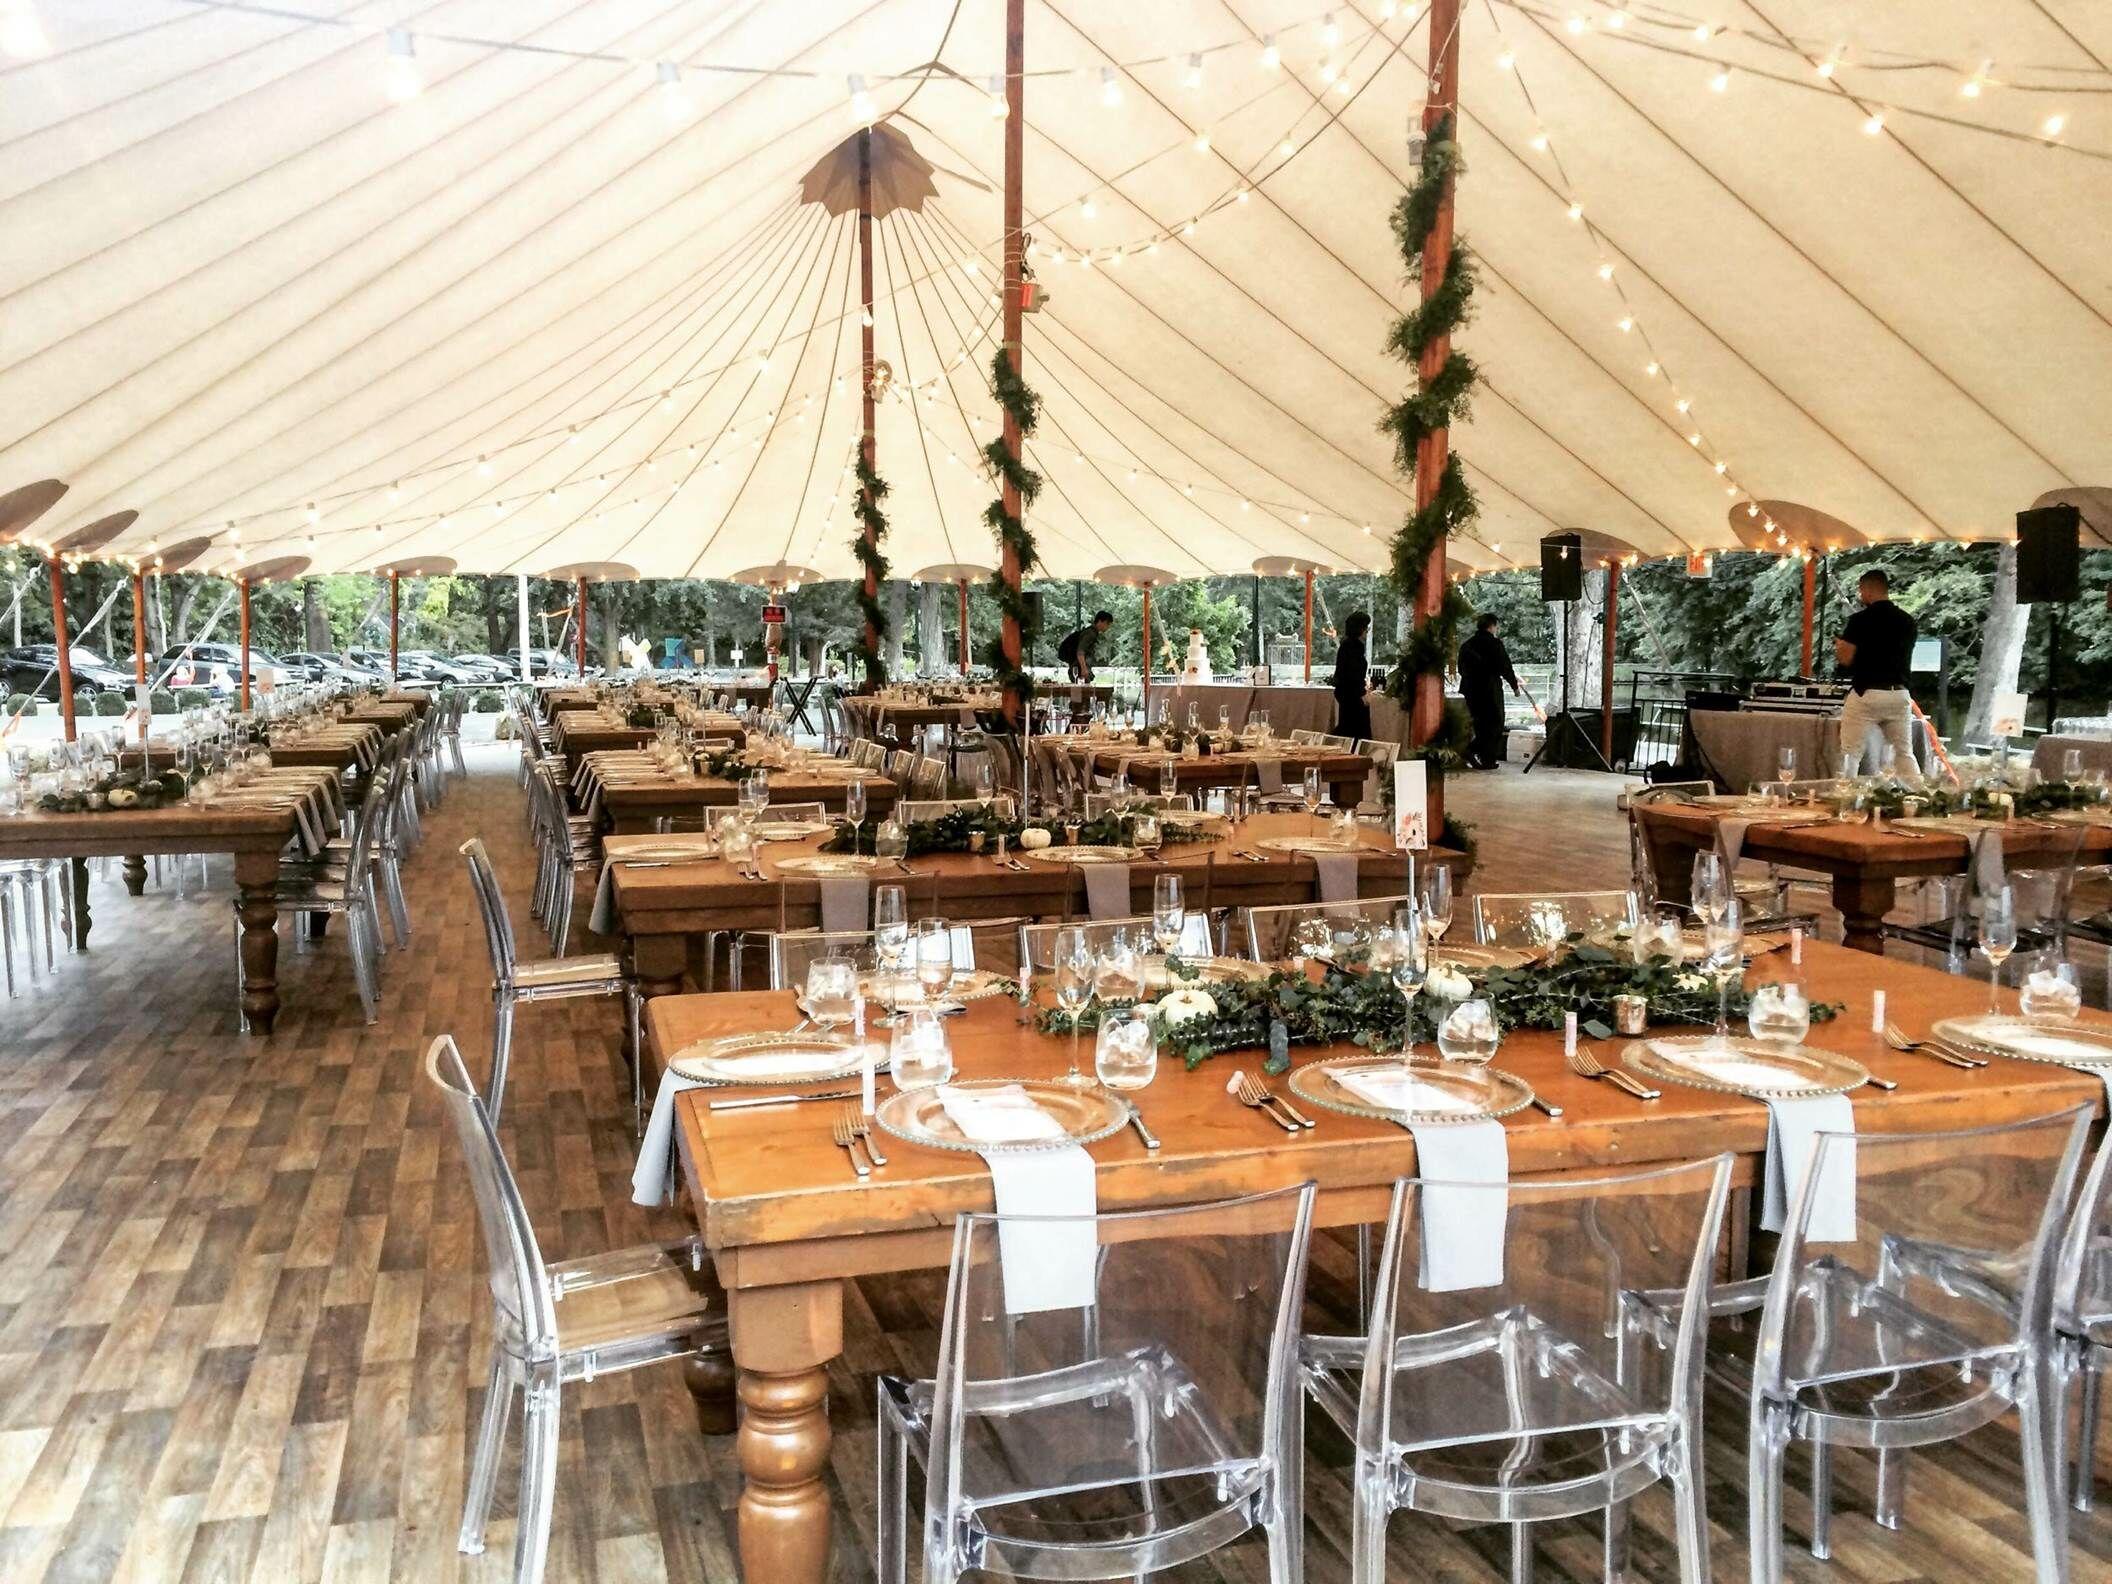 Wedding Venues in Norwalk, CT - The Knot